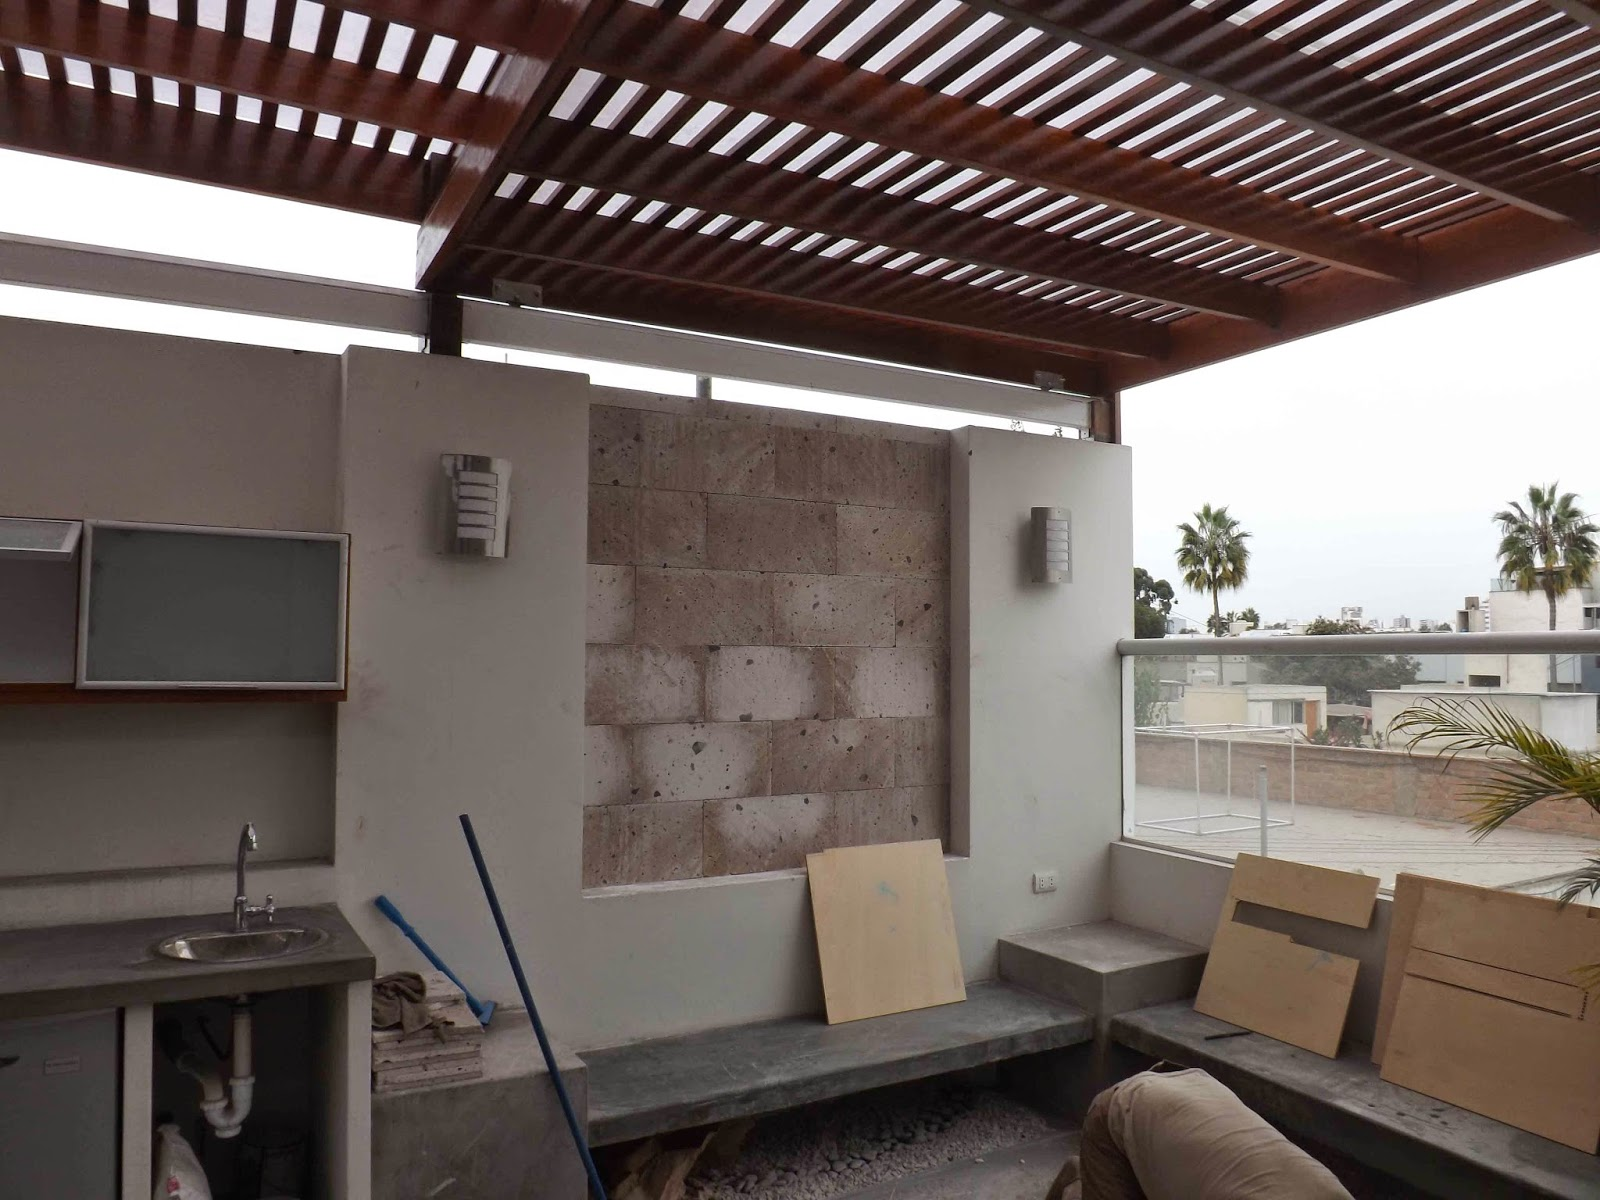 Oniria obra en proceso acabados en terraza - Diseno de terraza ...